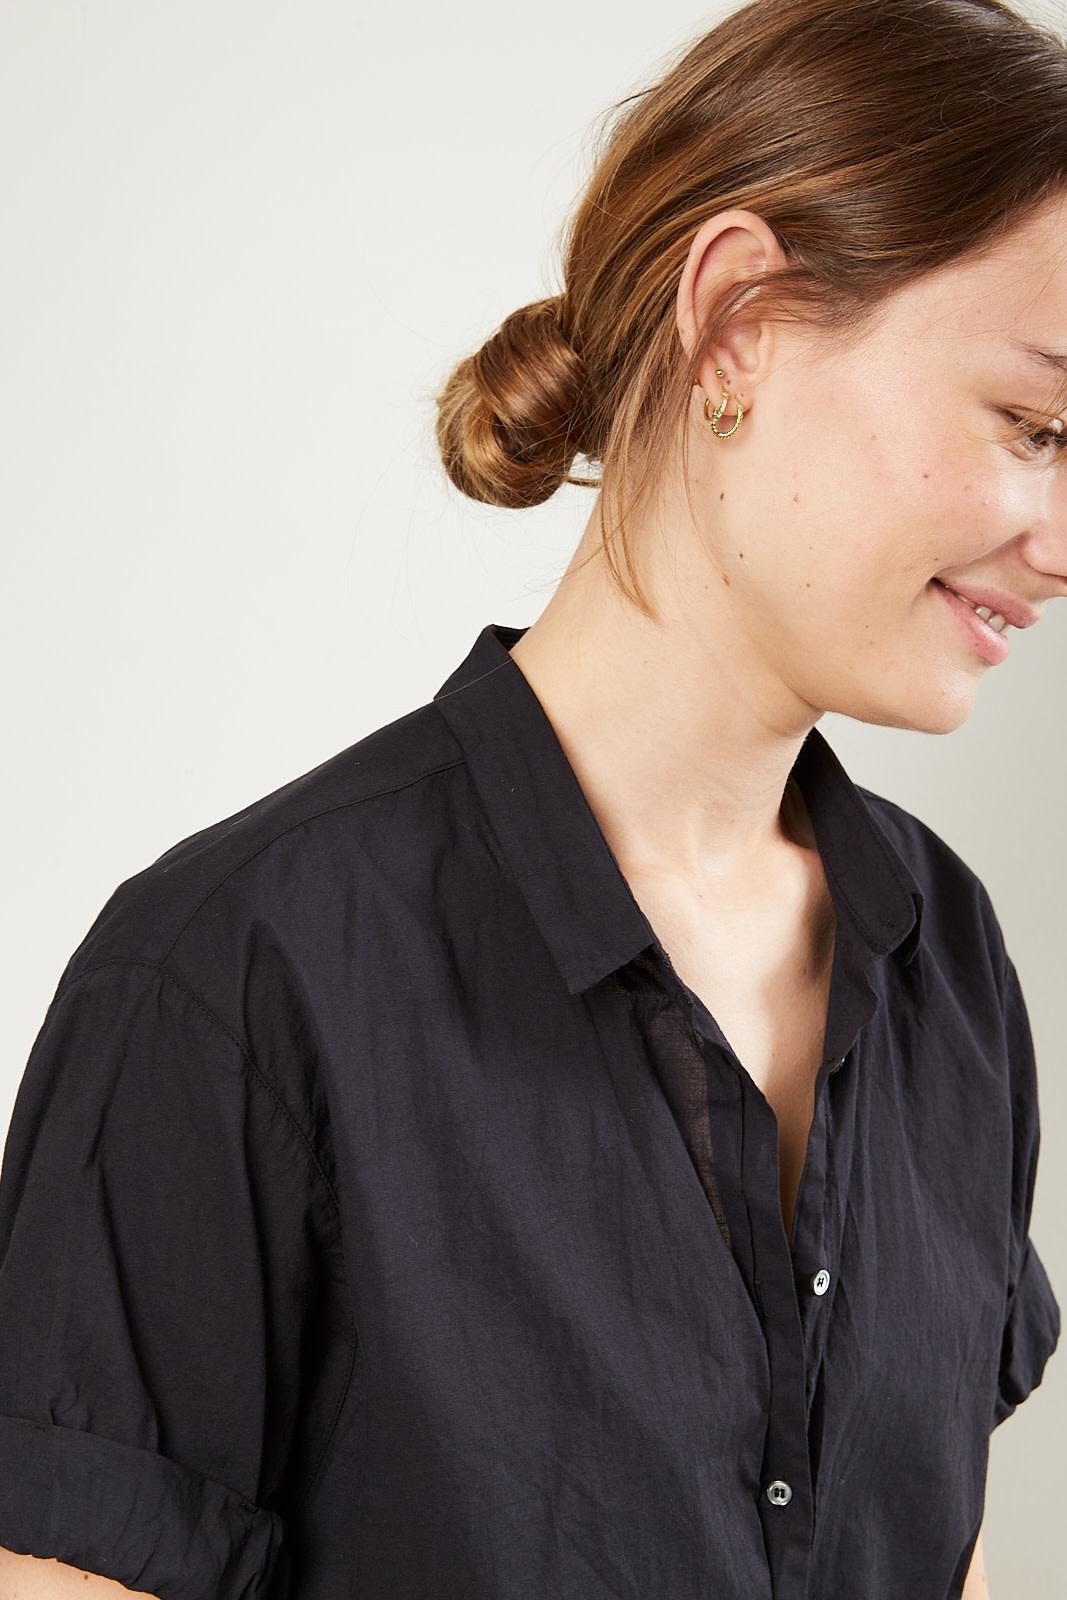 Xirena - Channing shirt